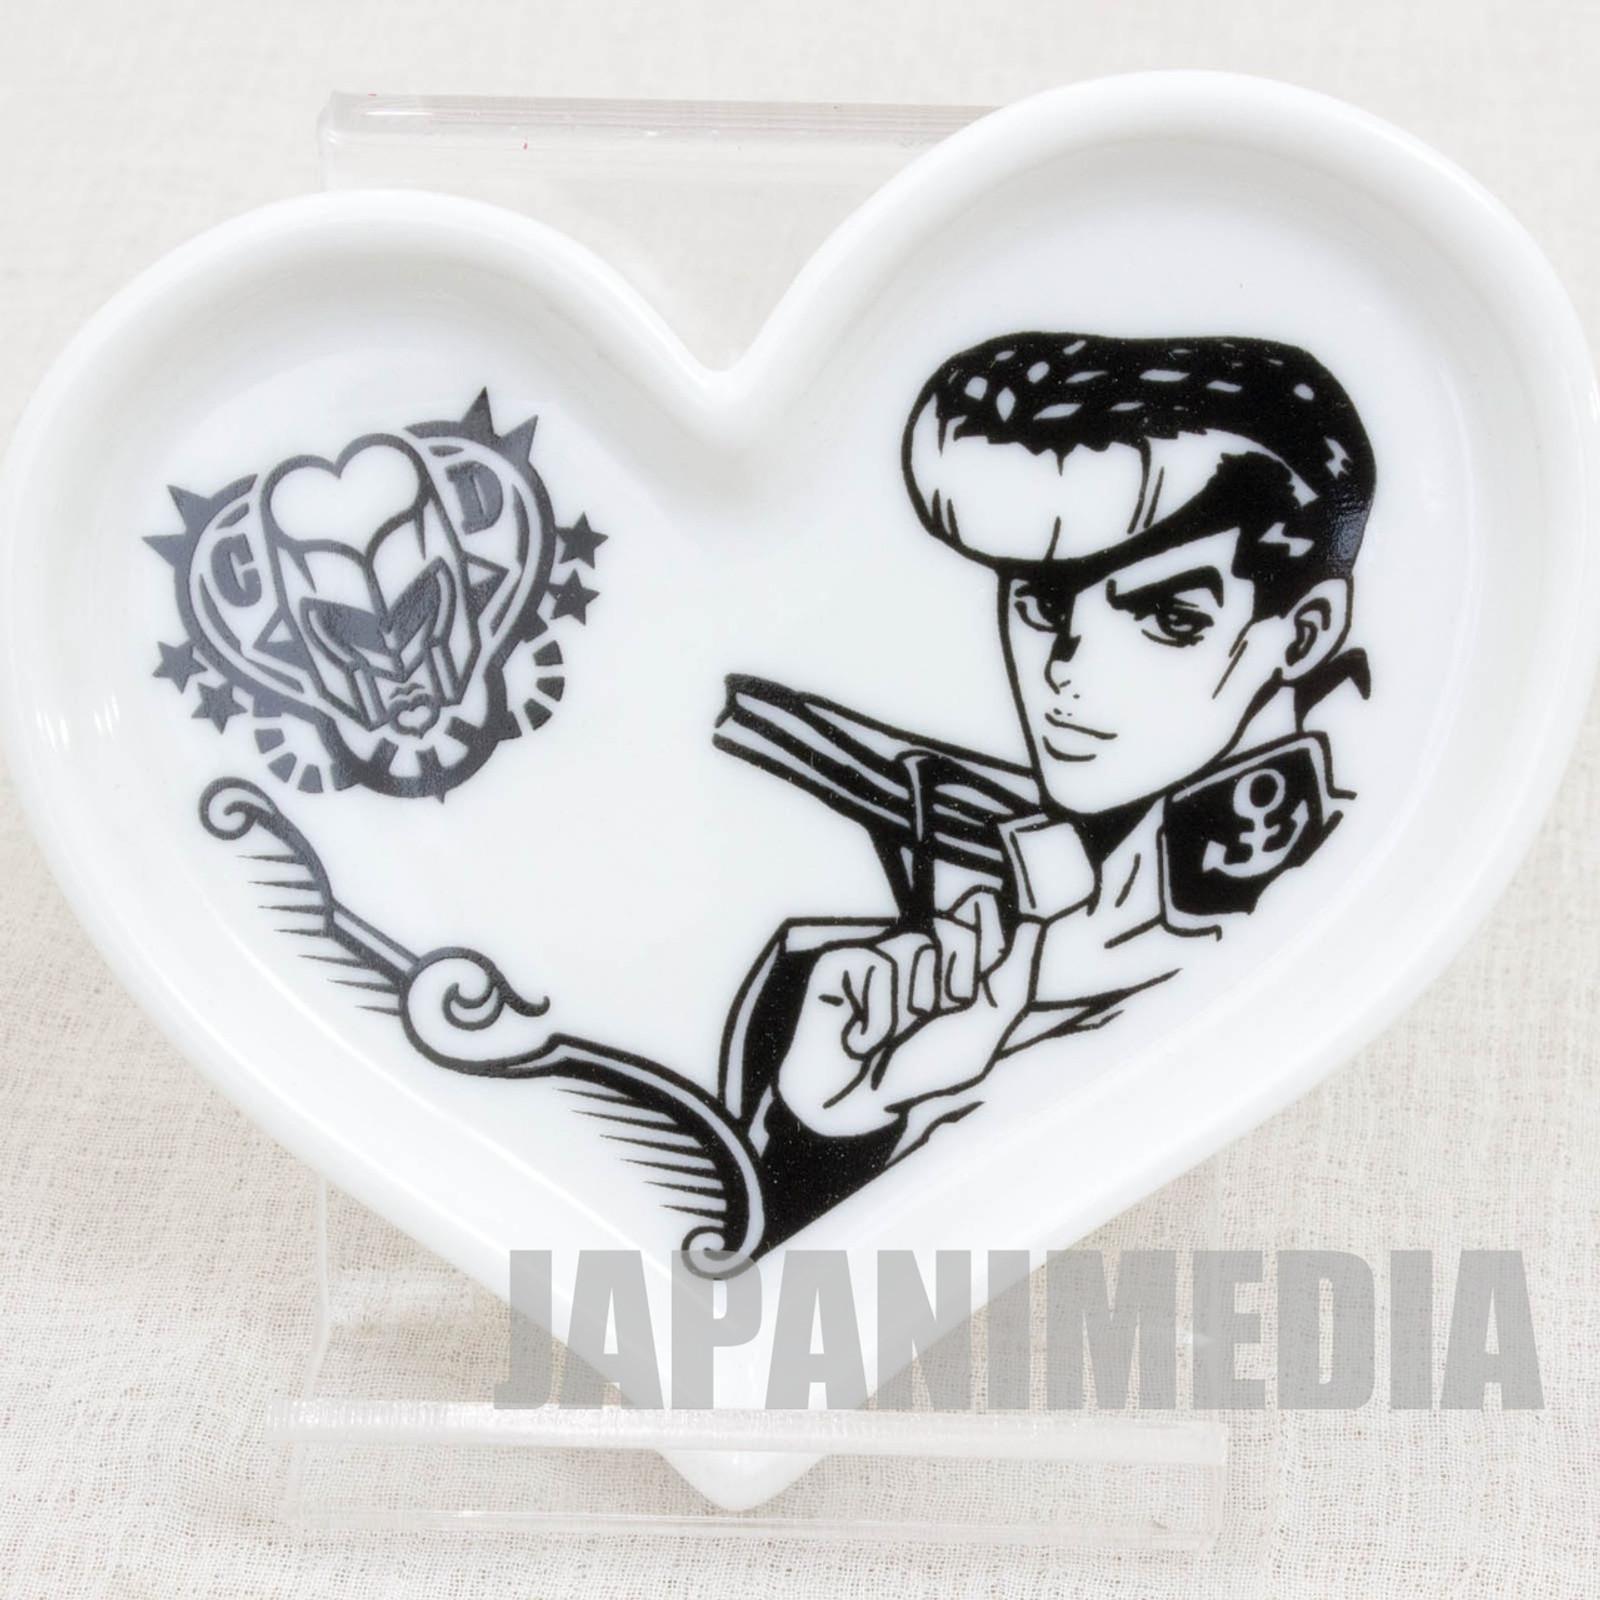 JoJo's Bizarre Adventure Diamond Is Unbreakable Higashikata Josuke Small Plate